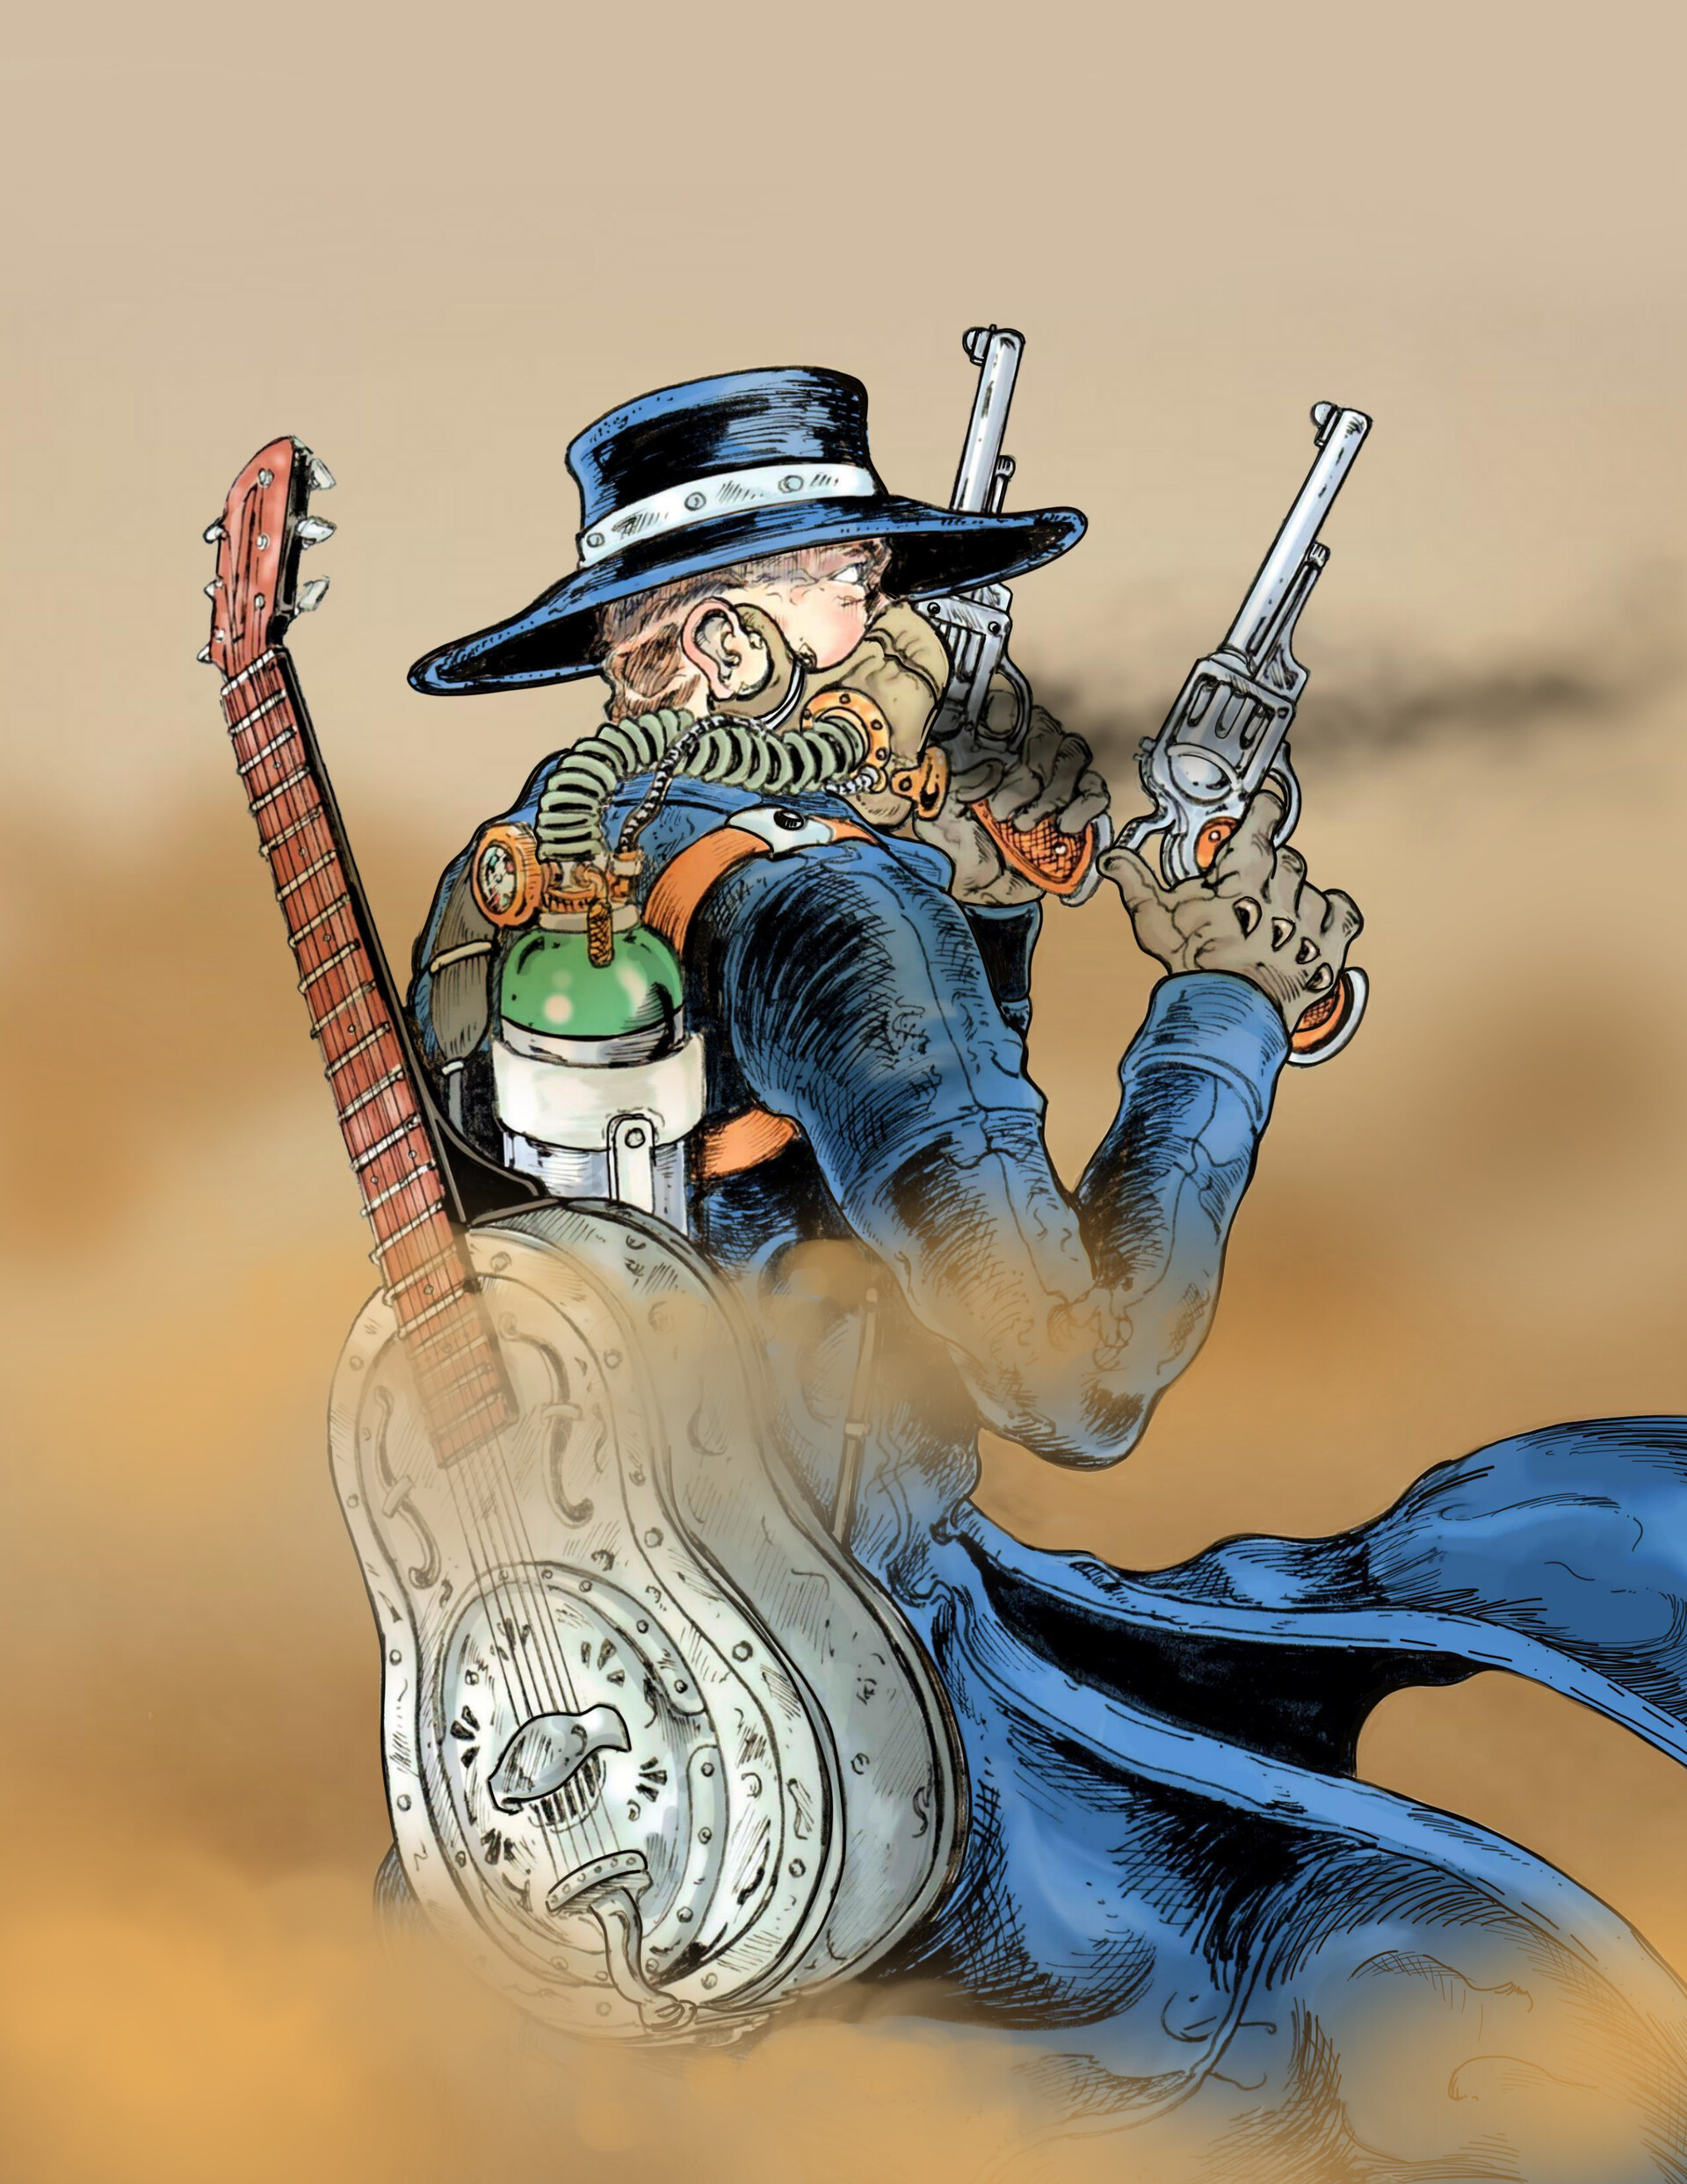 Vincent bryant coilhunter nox